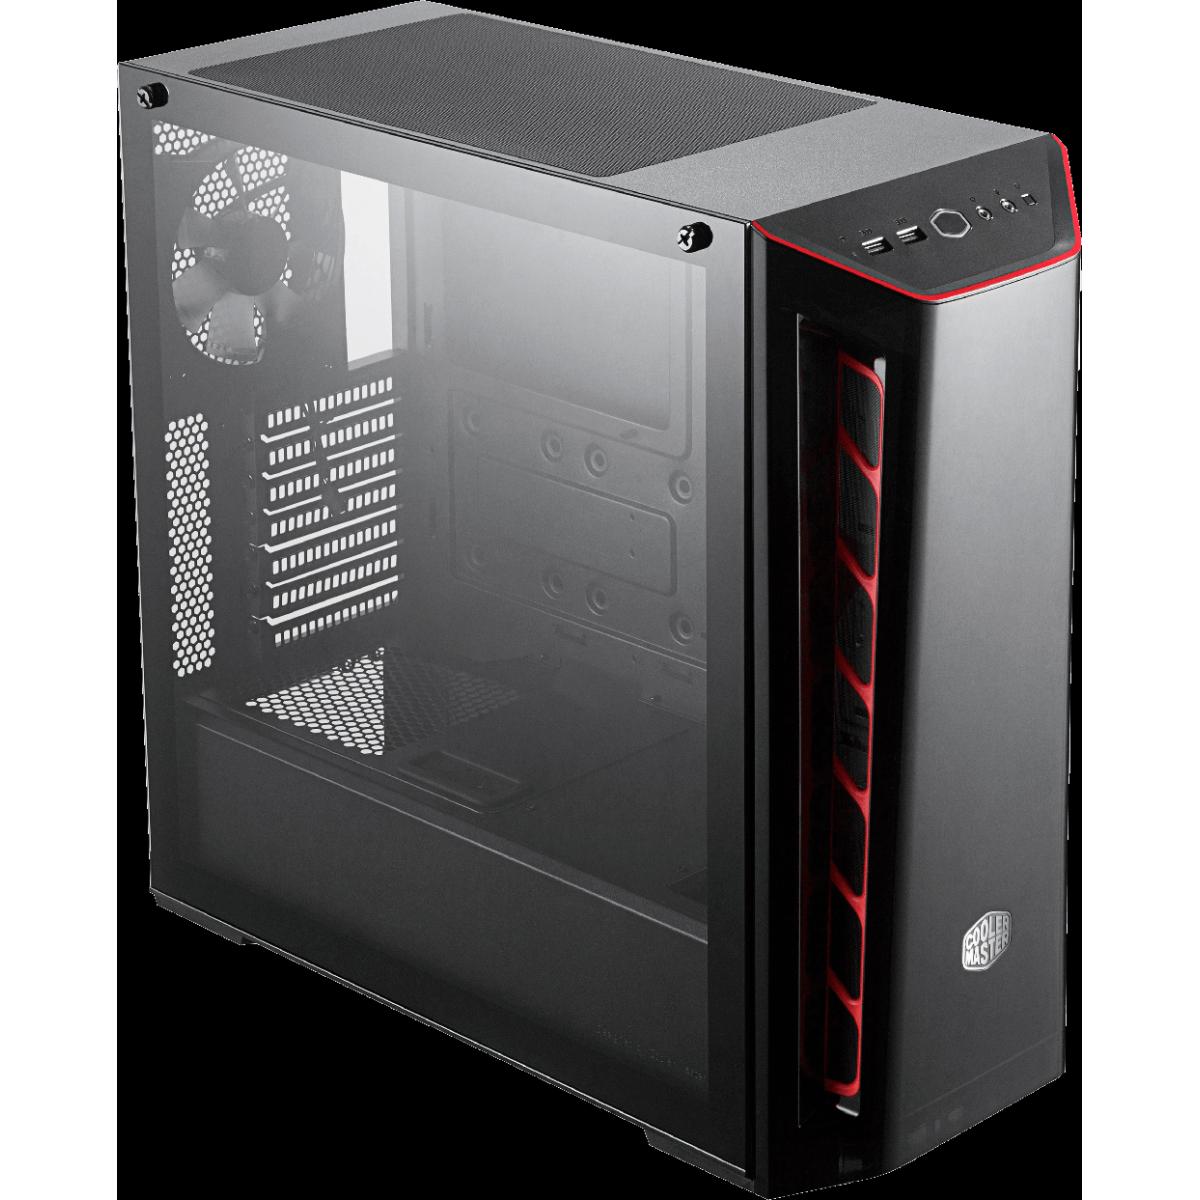 Gabinete Gamer Cooler Master Masterbox MB520 TG, Mid Tower, Vidro Temperado, Black, Sem Fonte, Com 1 Fan, MCB-B520-KGNN-S00